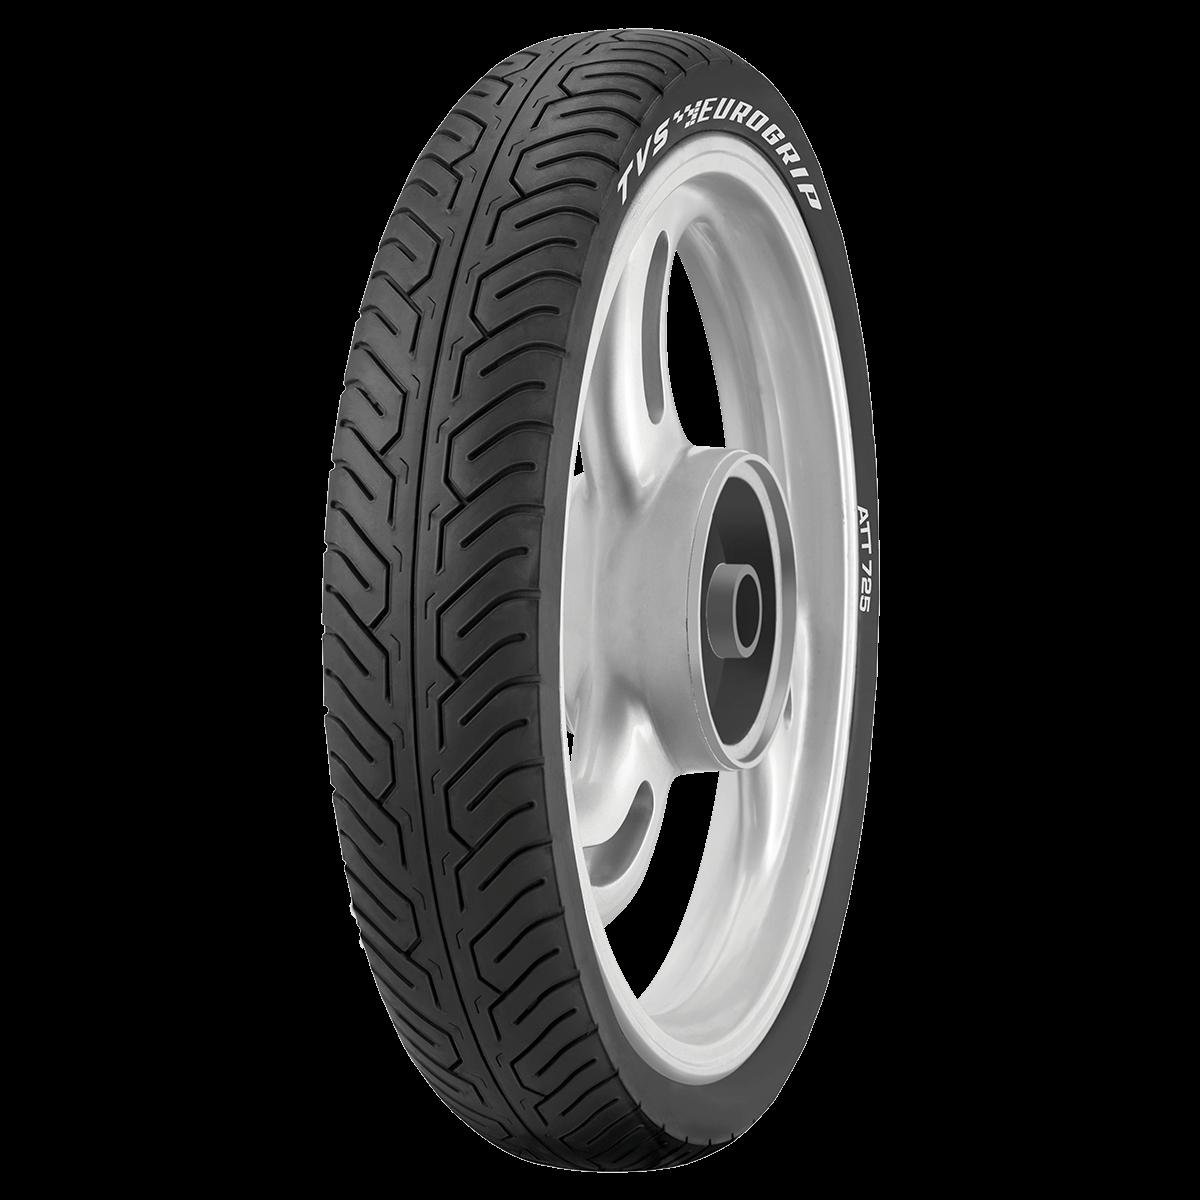 TVS ATT 725 90/90 17 Requires Tube 49 P Front Two-Wheeler Tyre